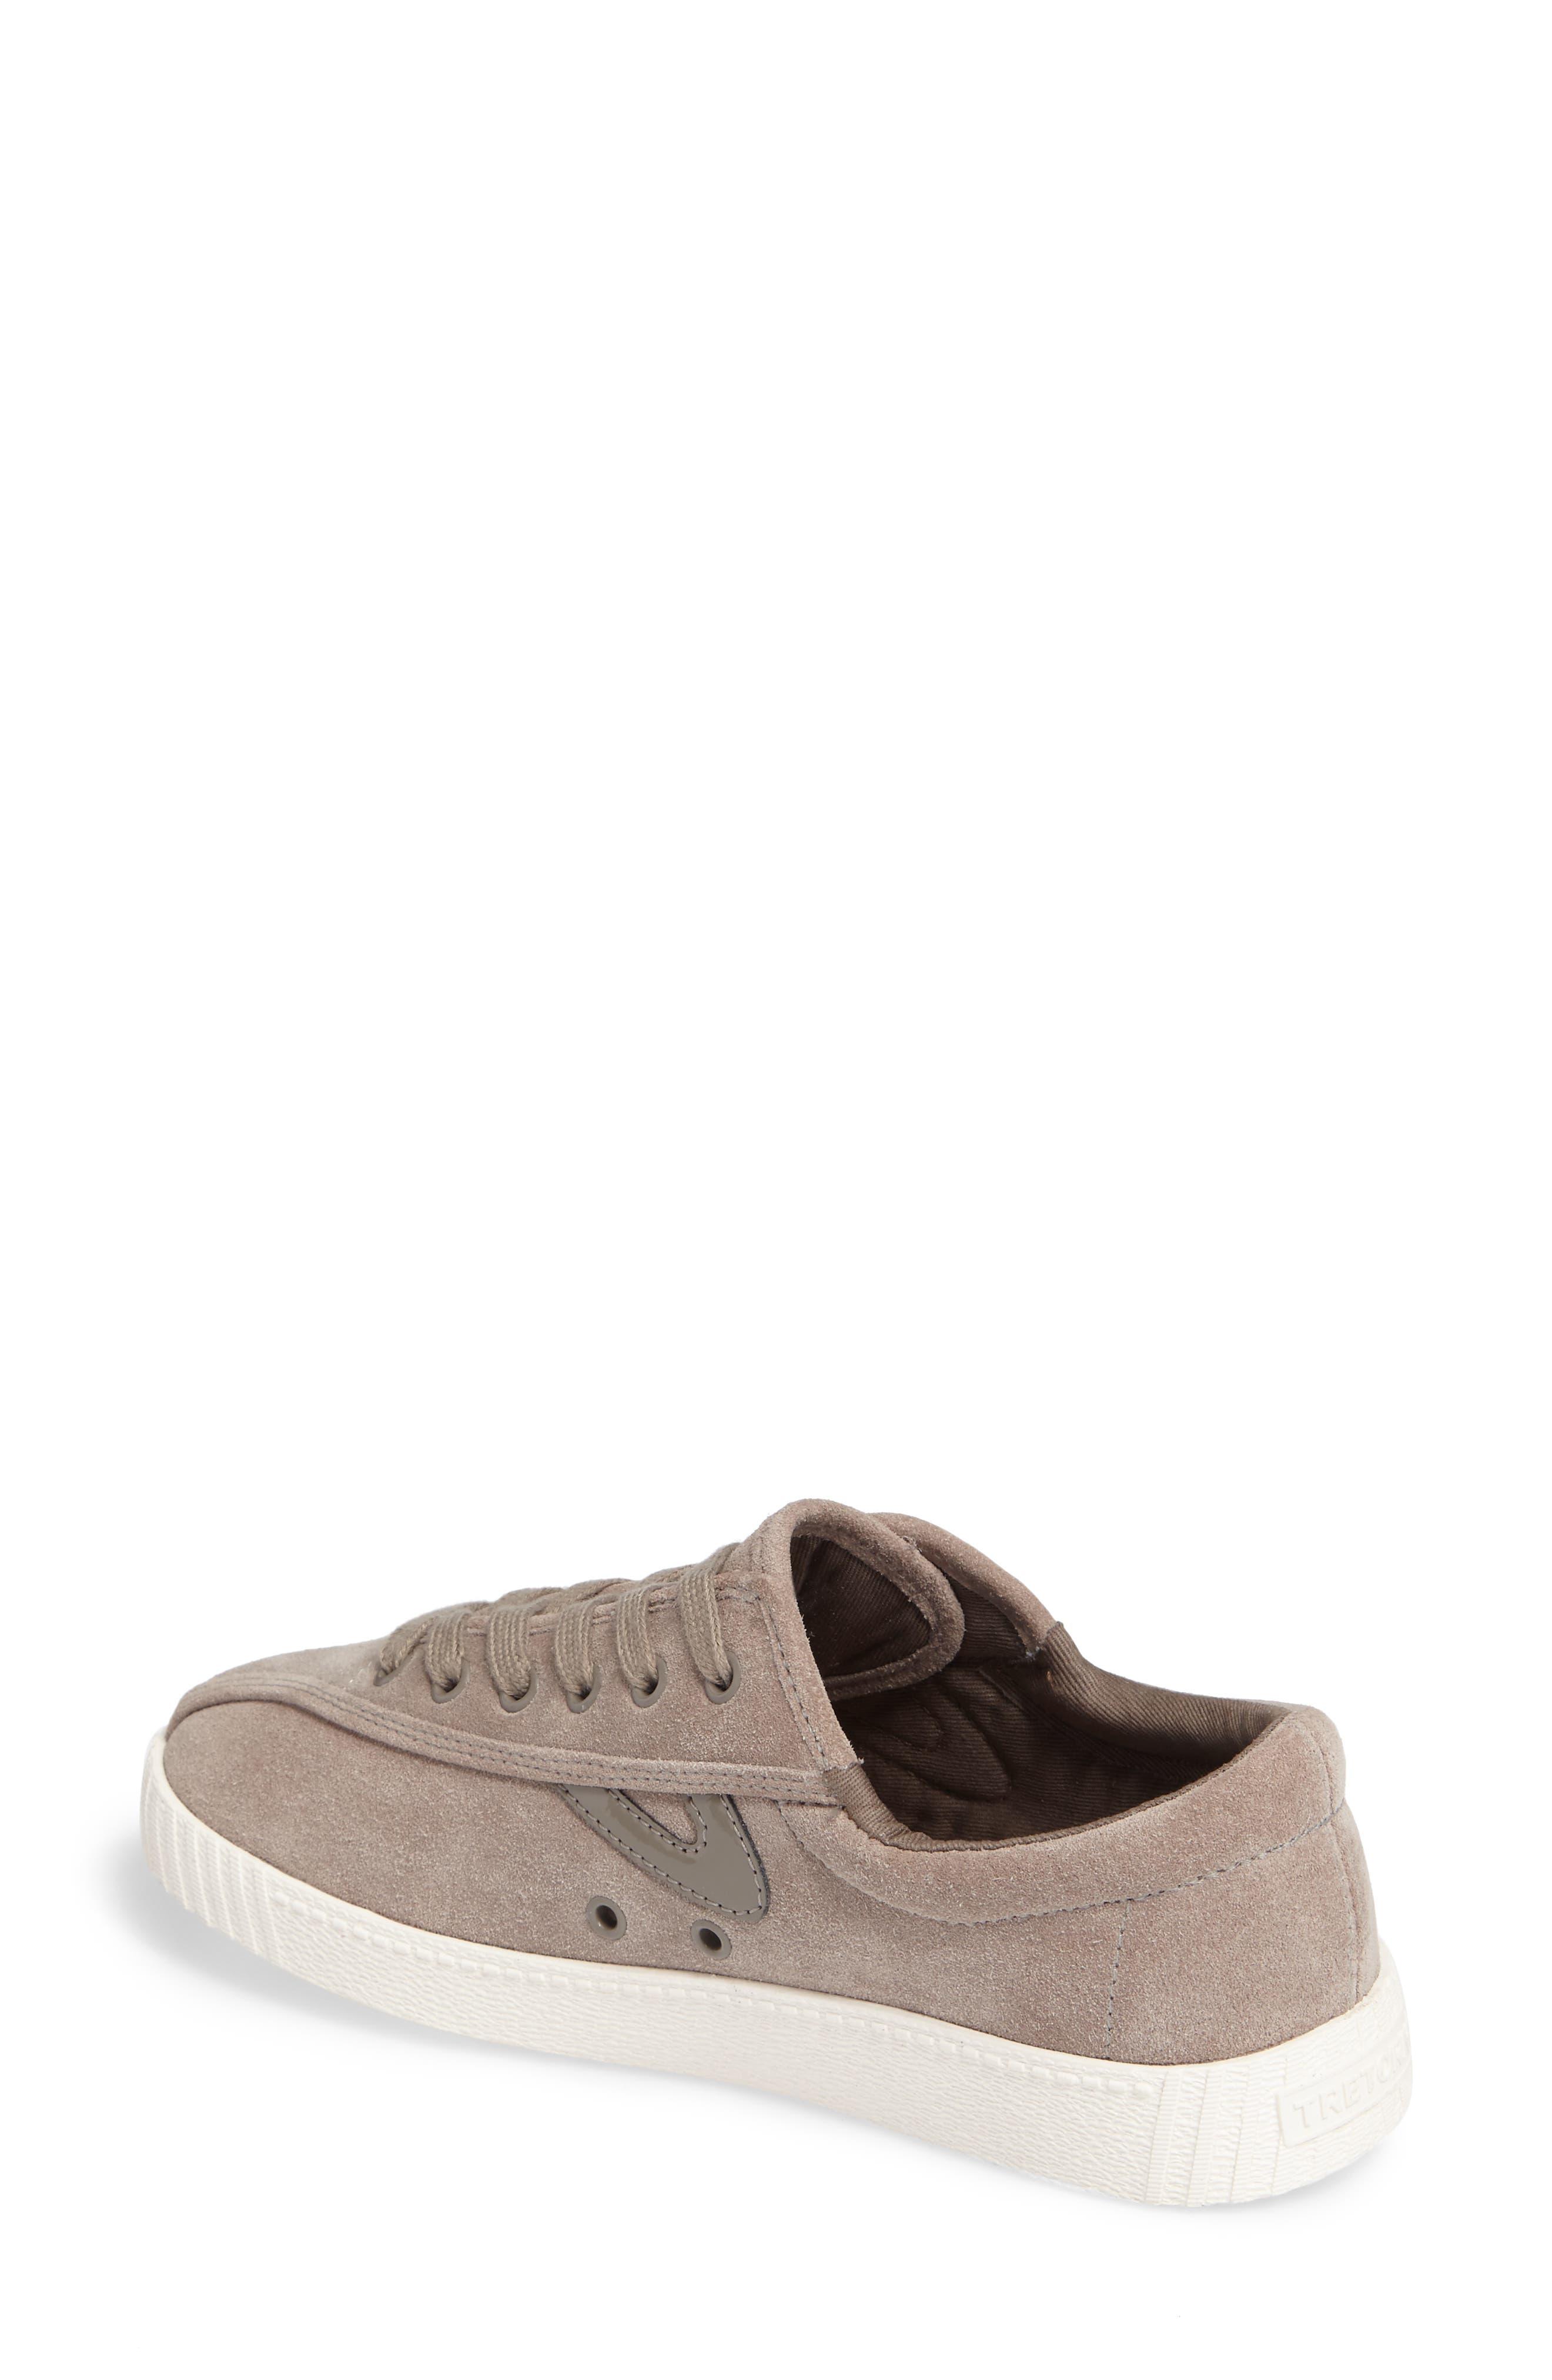 Alternate Image 2  - Tretorn 'Nylite2 Plus' Sneaker (Women)